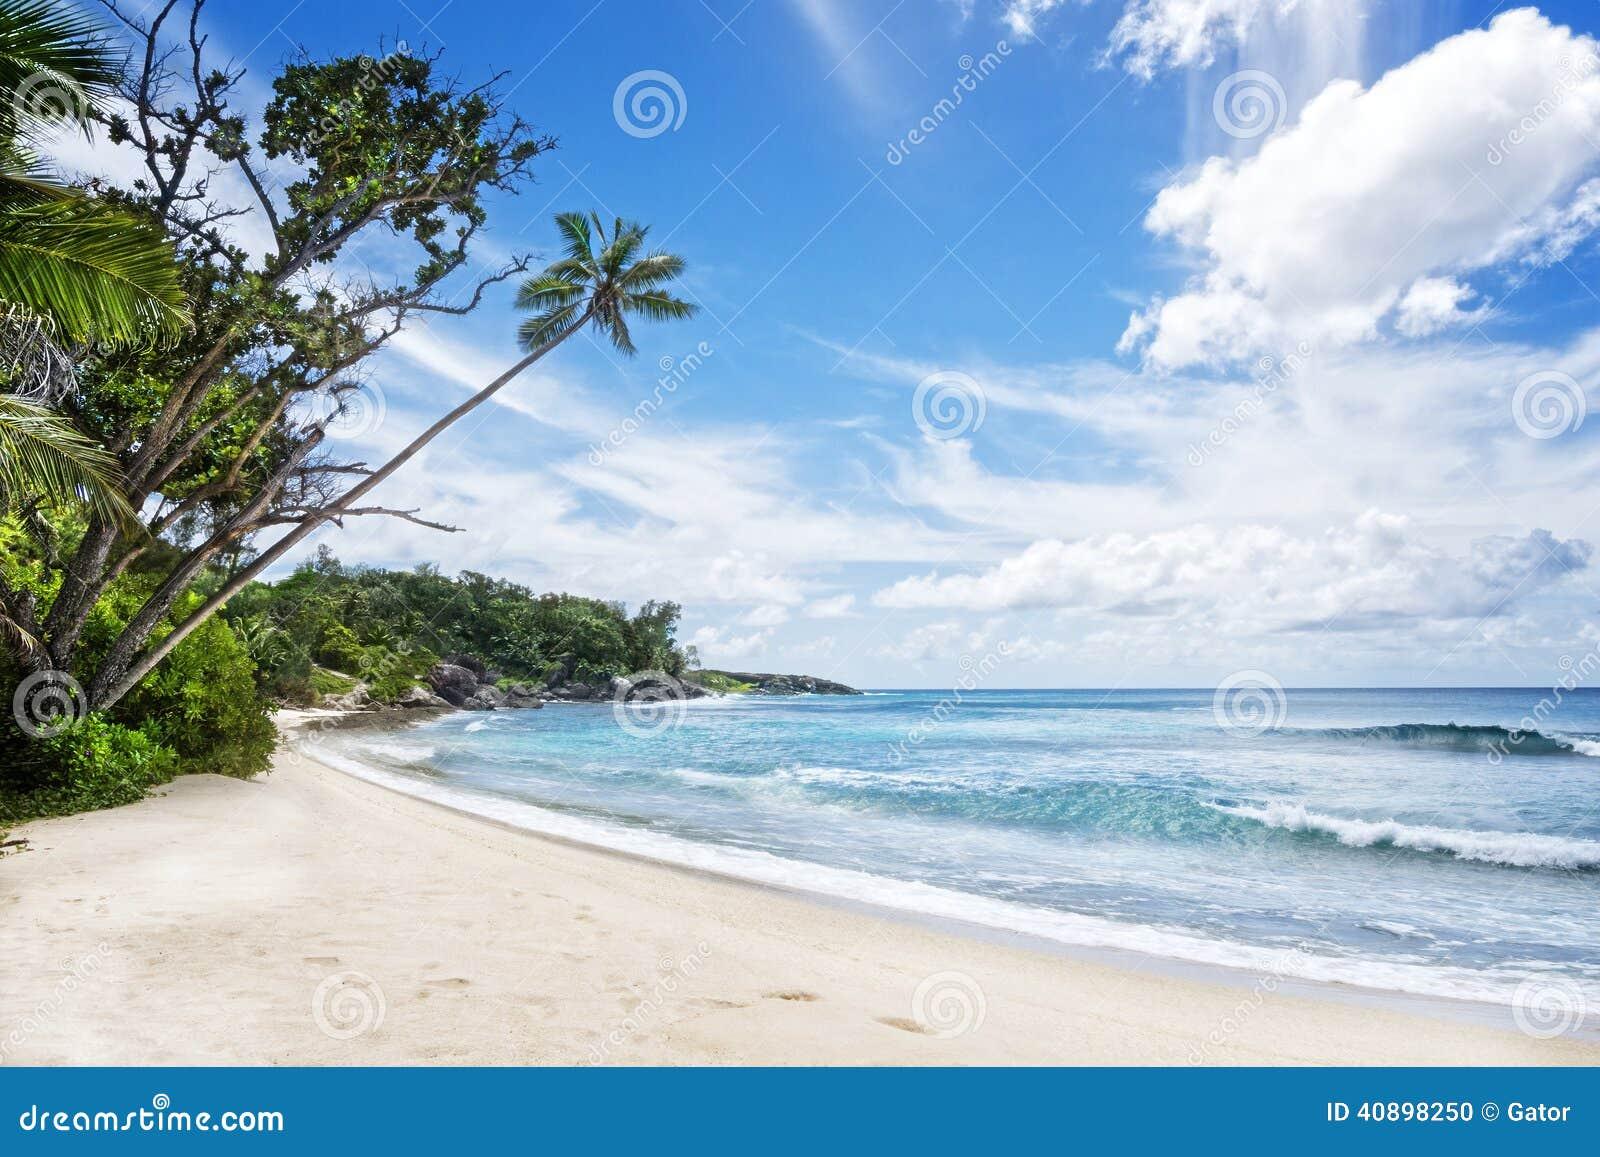 Deserted Tropical Island: Tropical Island Stock Photo